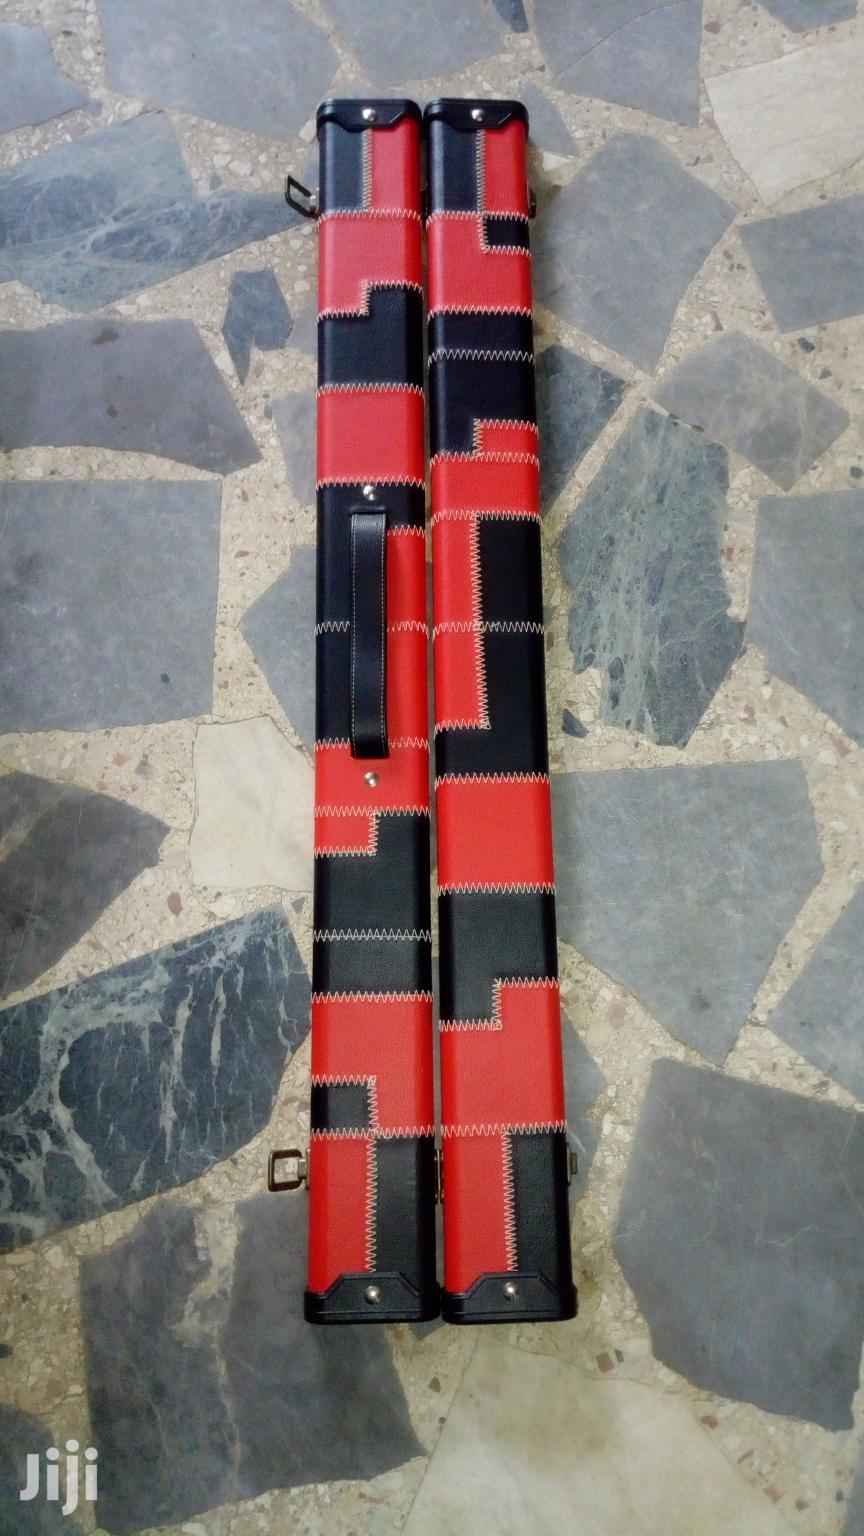 Original Pack for Snooker Stick | Sports Equipment for sale in Warri, Delta State, Nigeria